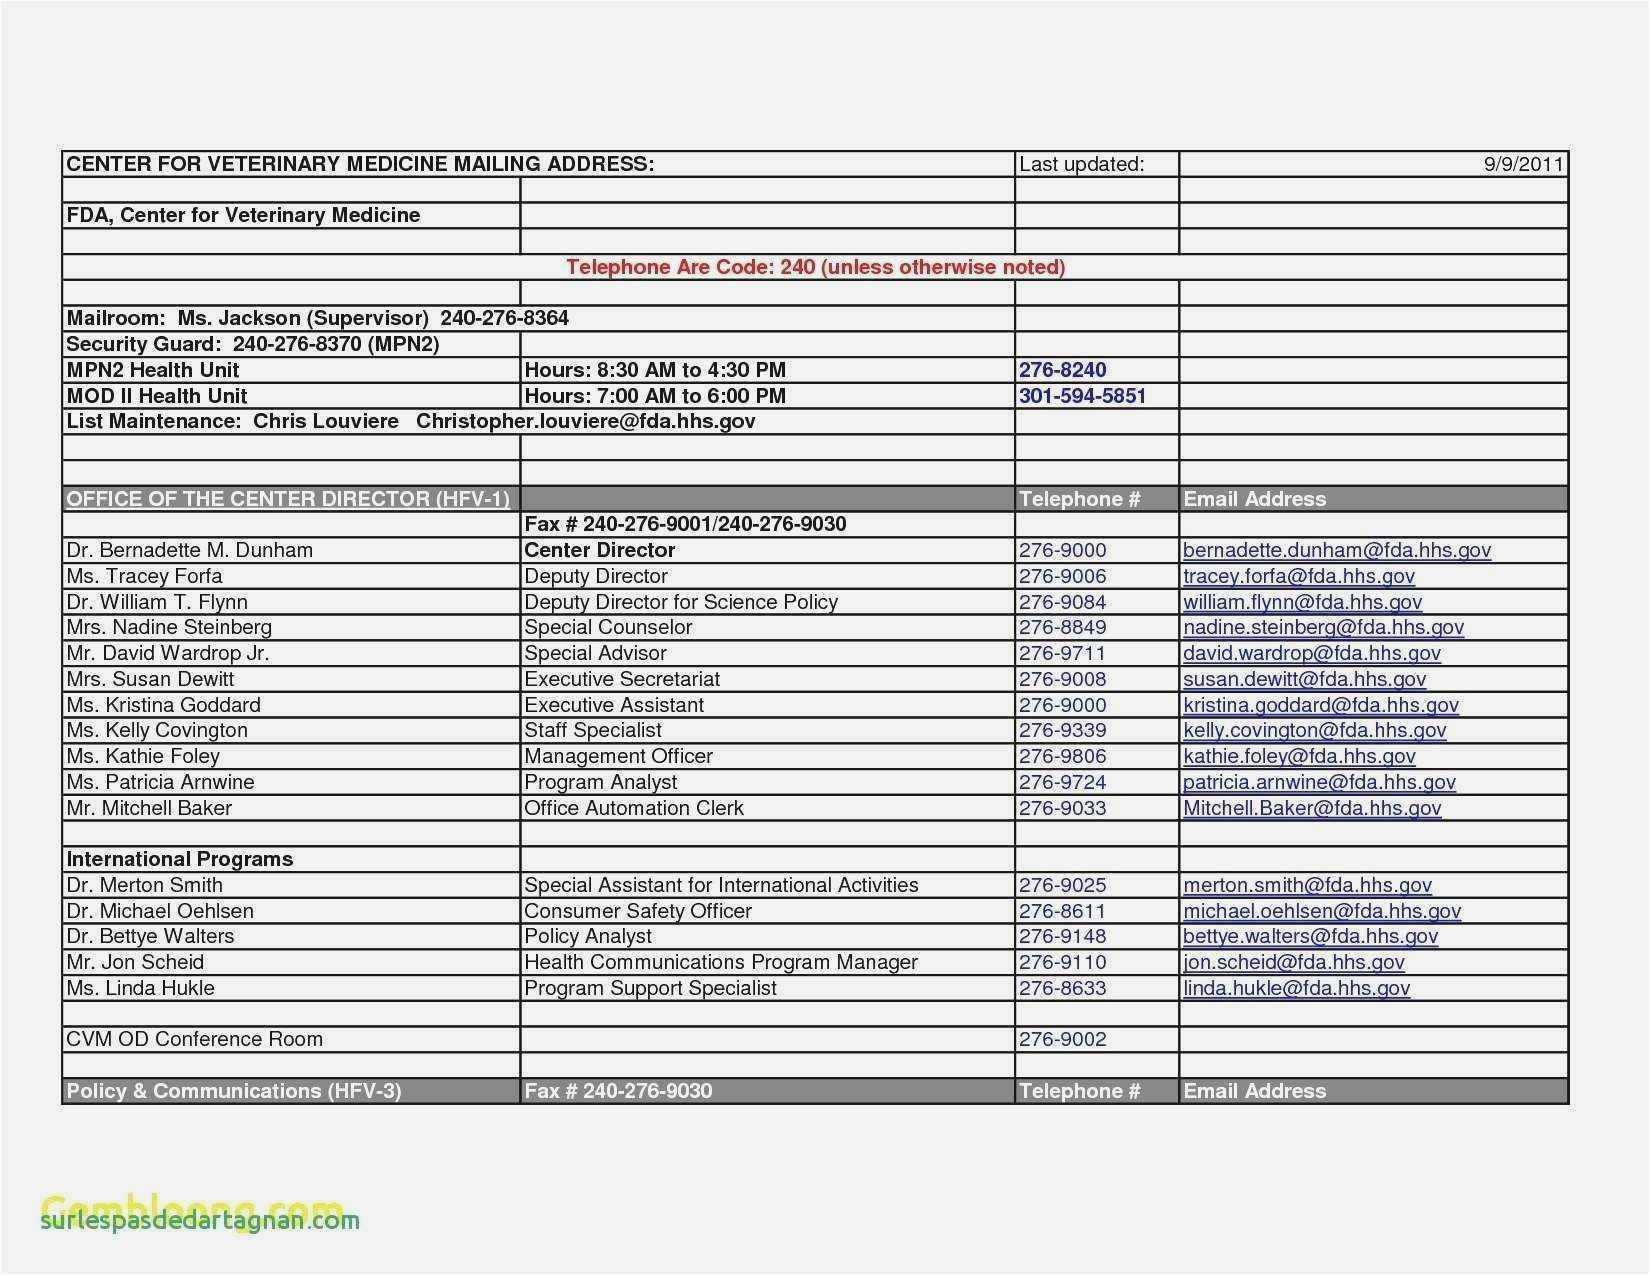 021 Homeschool Report Card Template Free Ideas Download With Homeschool Middle School Report Card Template